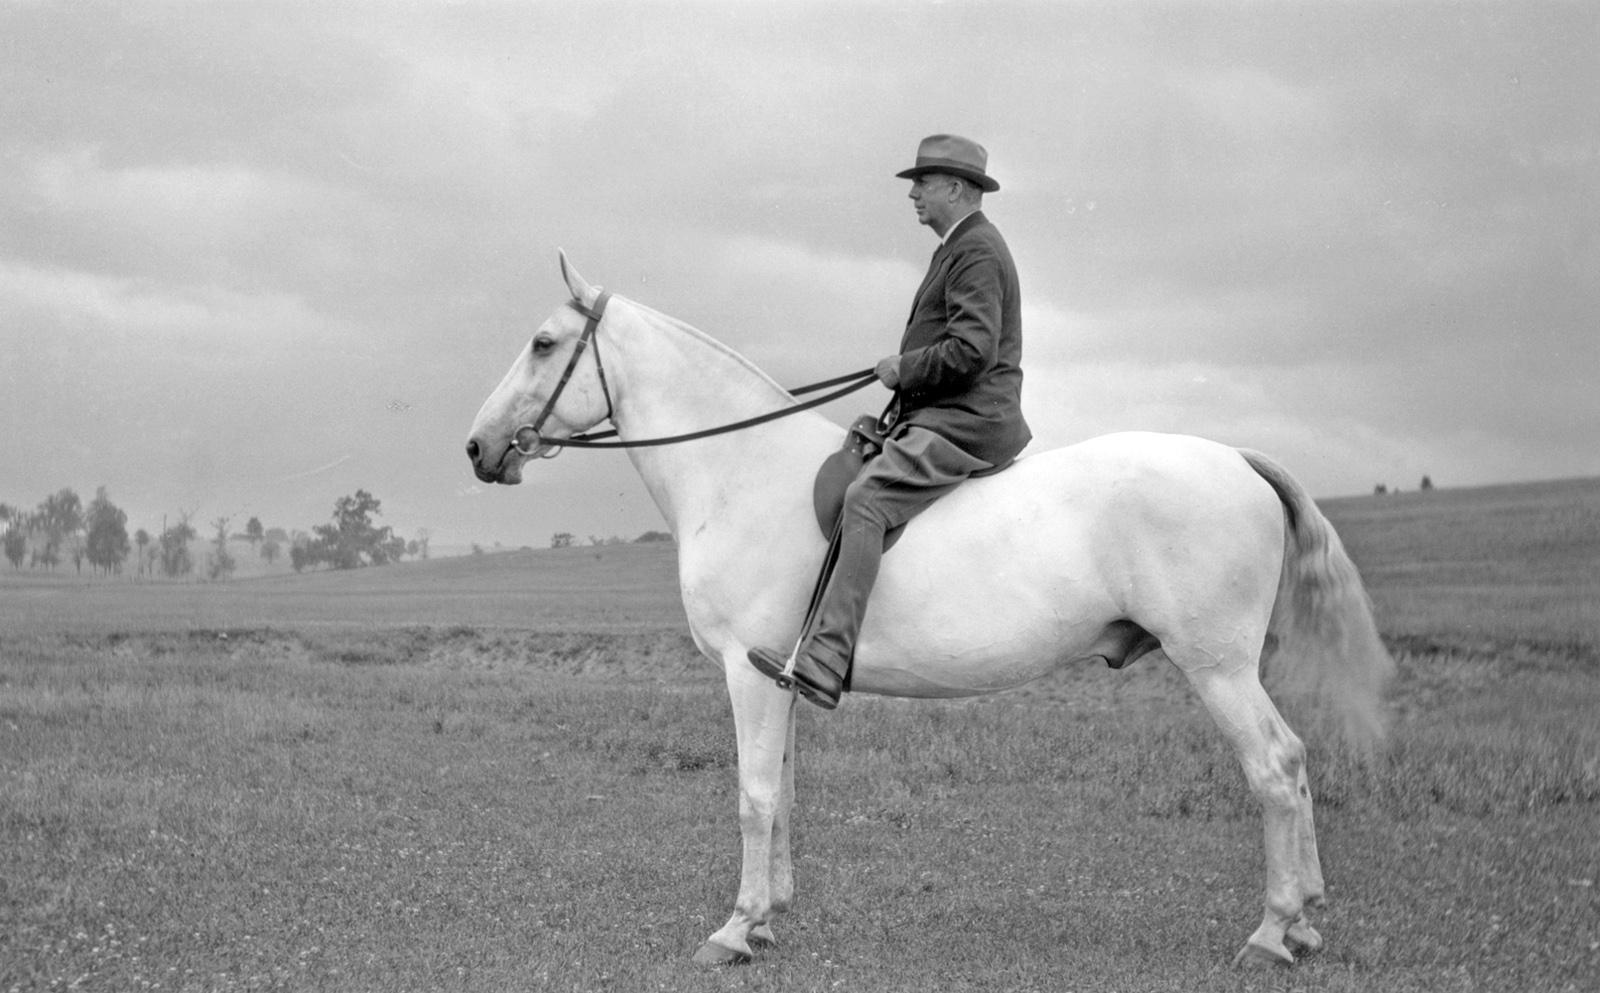 A. B. Hancock on horseback, June 1932 (Grayson-Sutcliffe Collection)